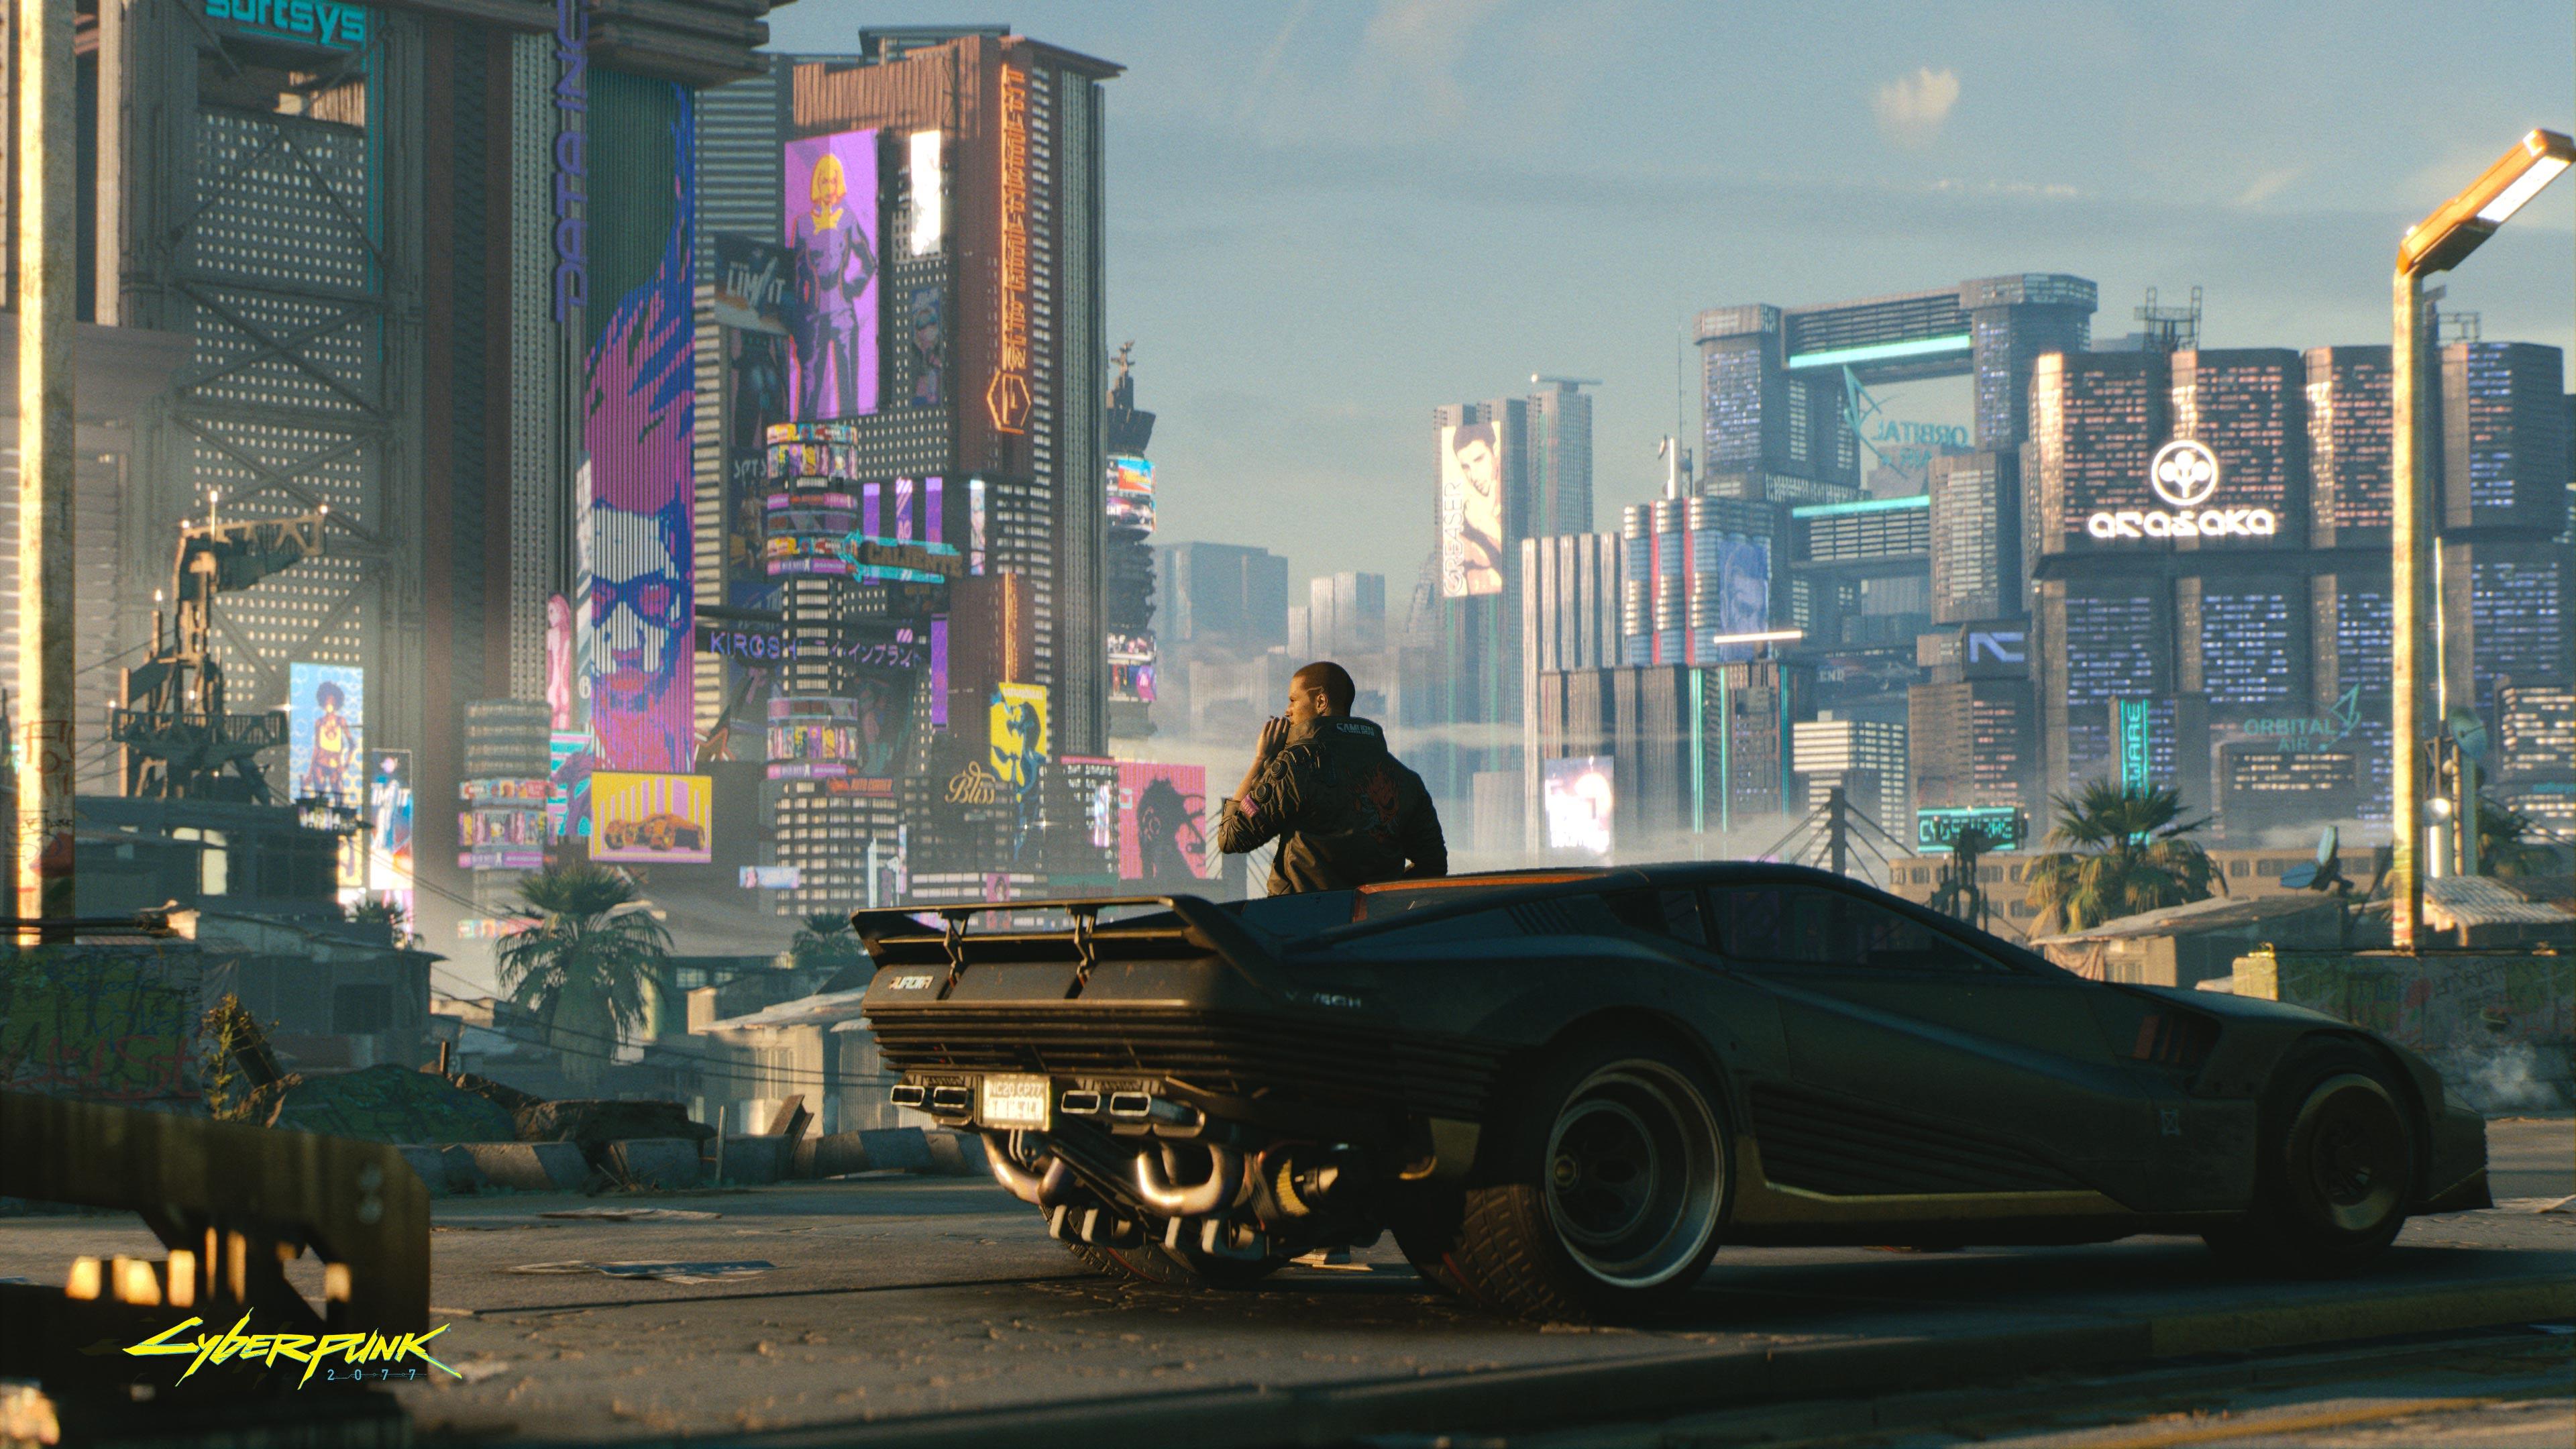 General 3840x2160 Cyberpunk 2077 video games CD Projekt RED PC gaming car vehicle black cars futuristic city futuristic